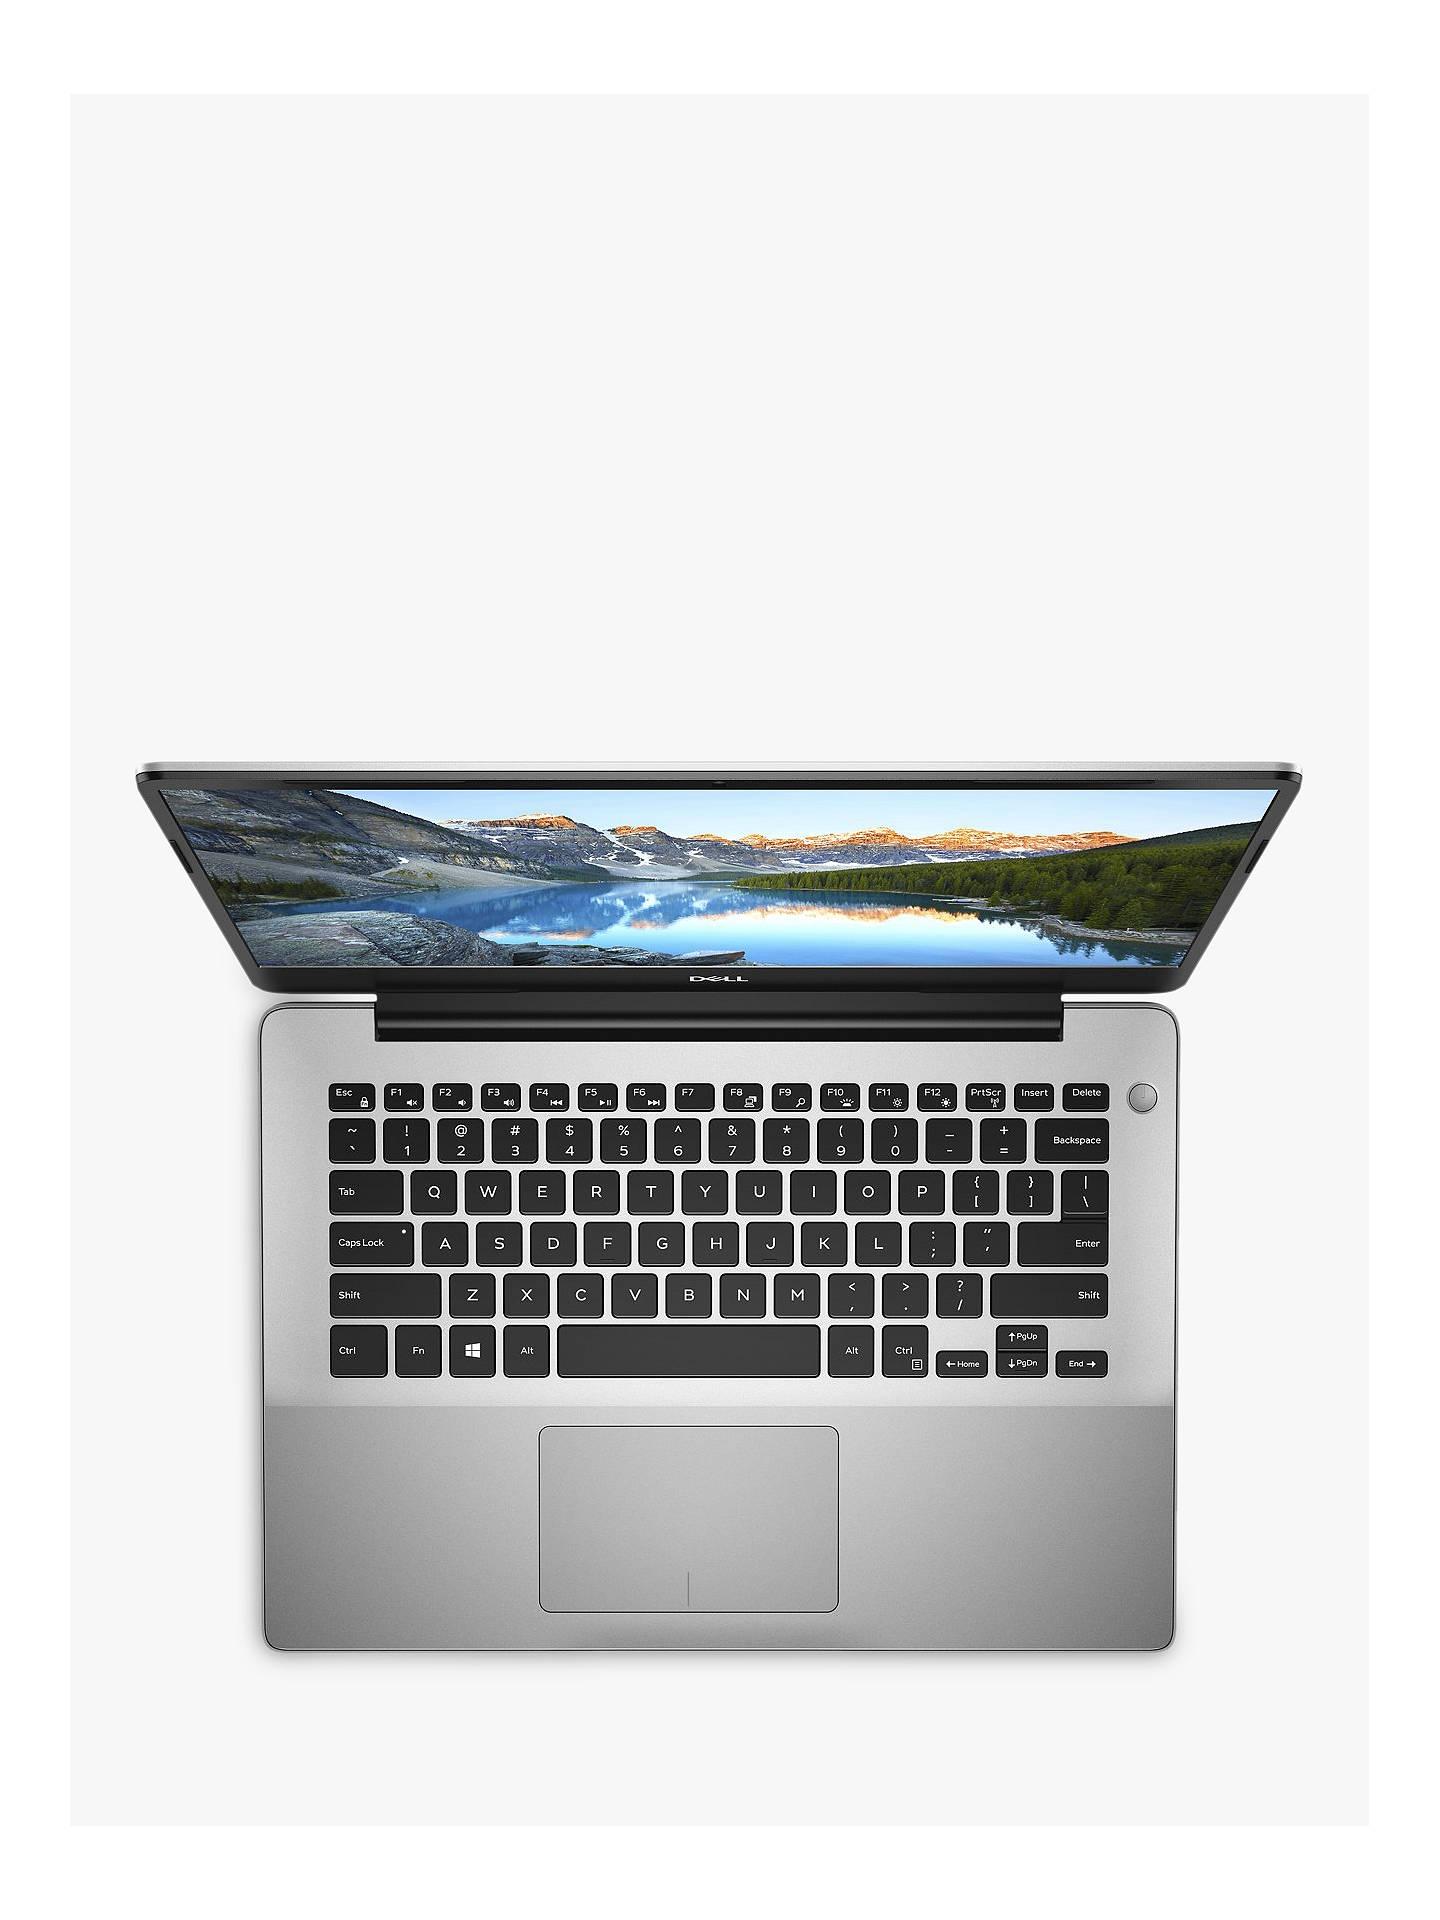 "Dell Inspiron 14 5480 laptop, Intel Core i5 Processor, 8GB RAM, 256GB SSD,  14"" Full HD, Silver"